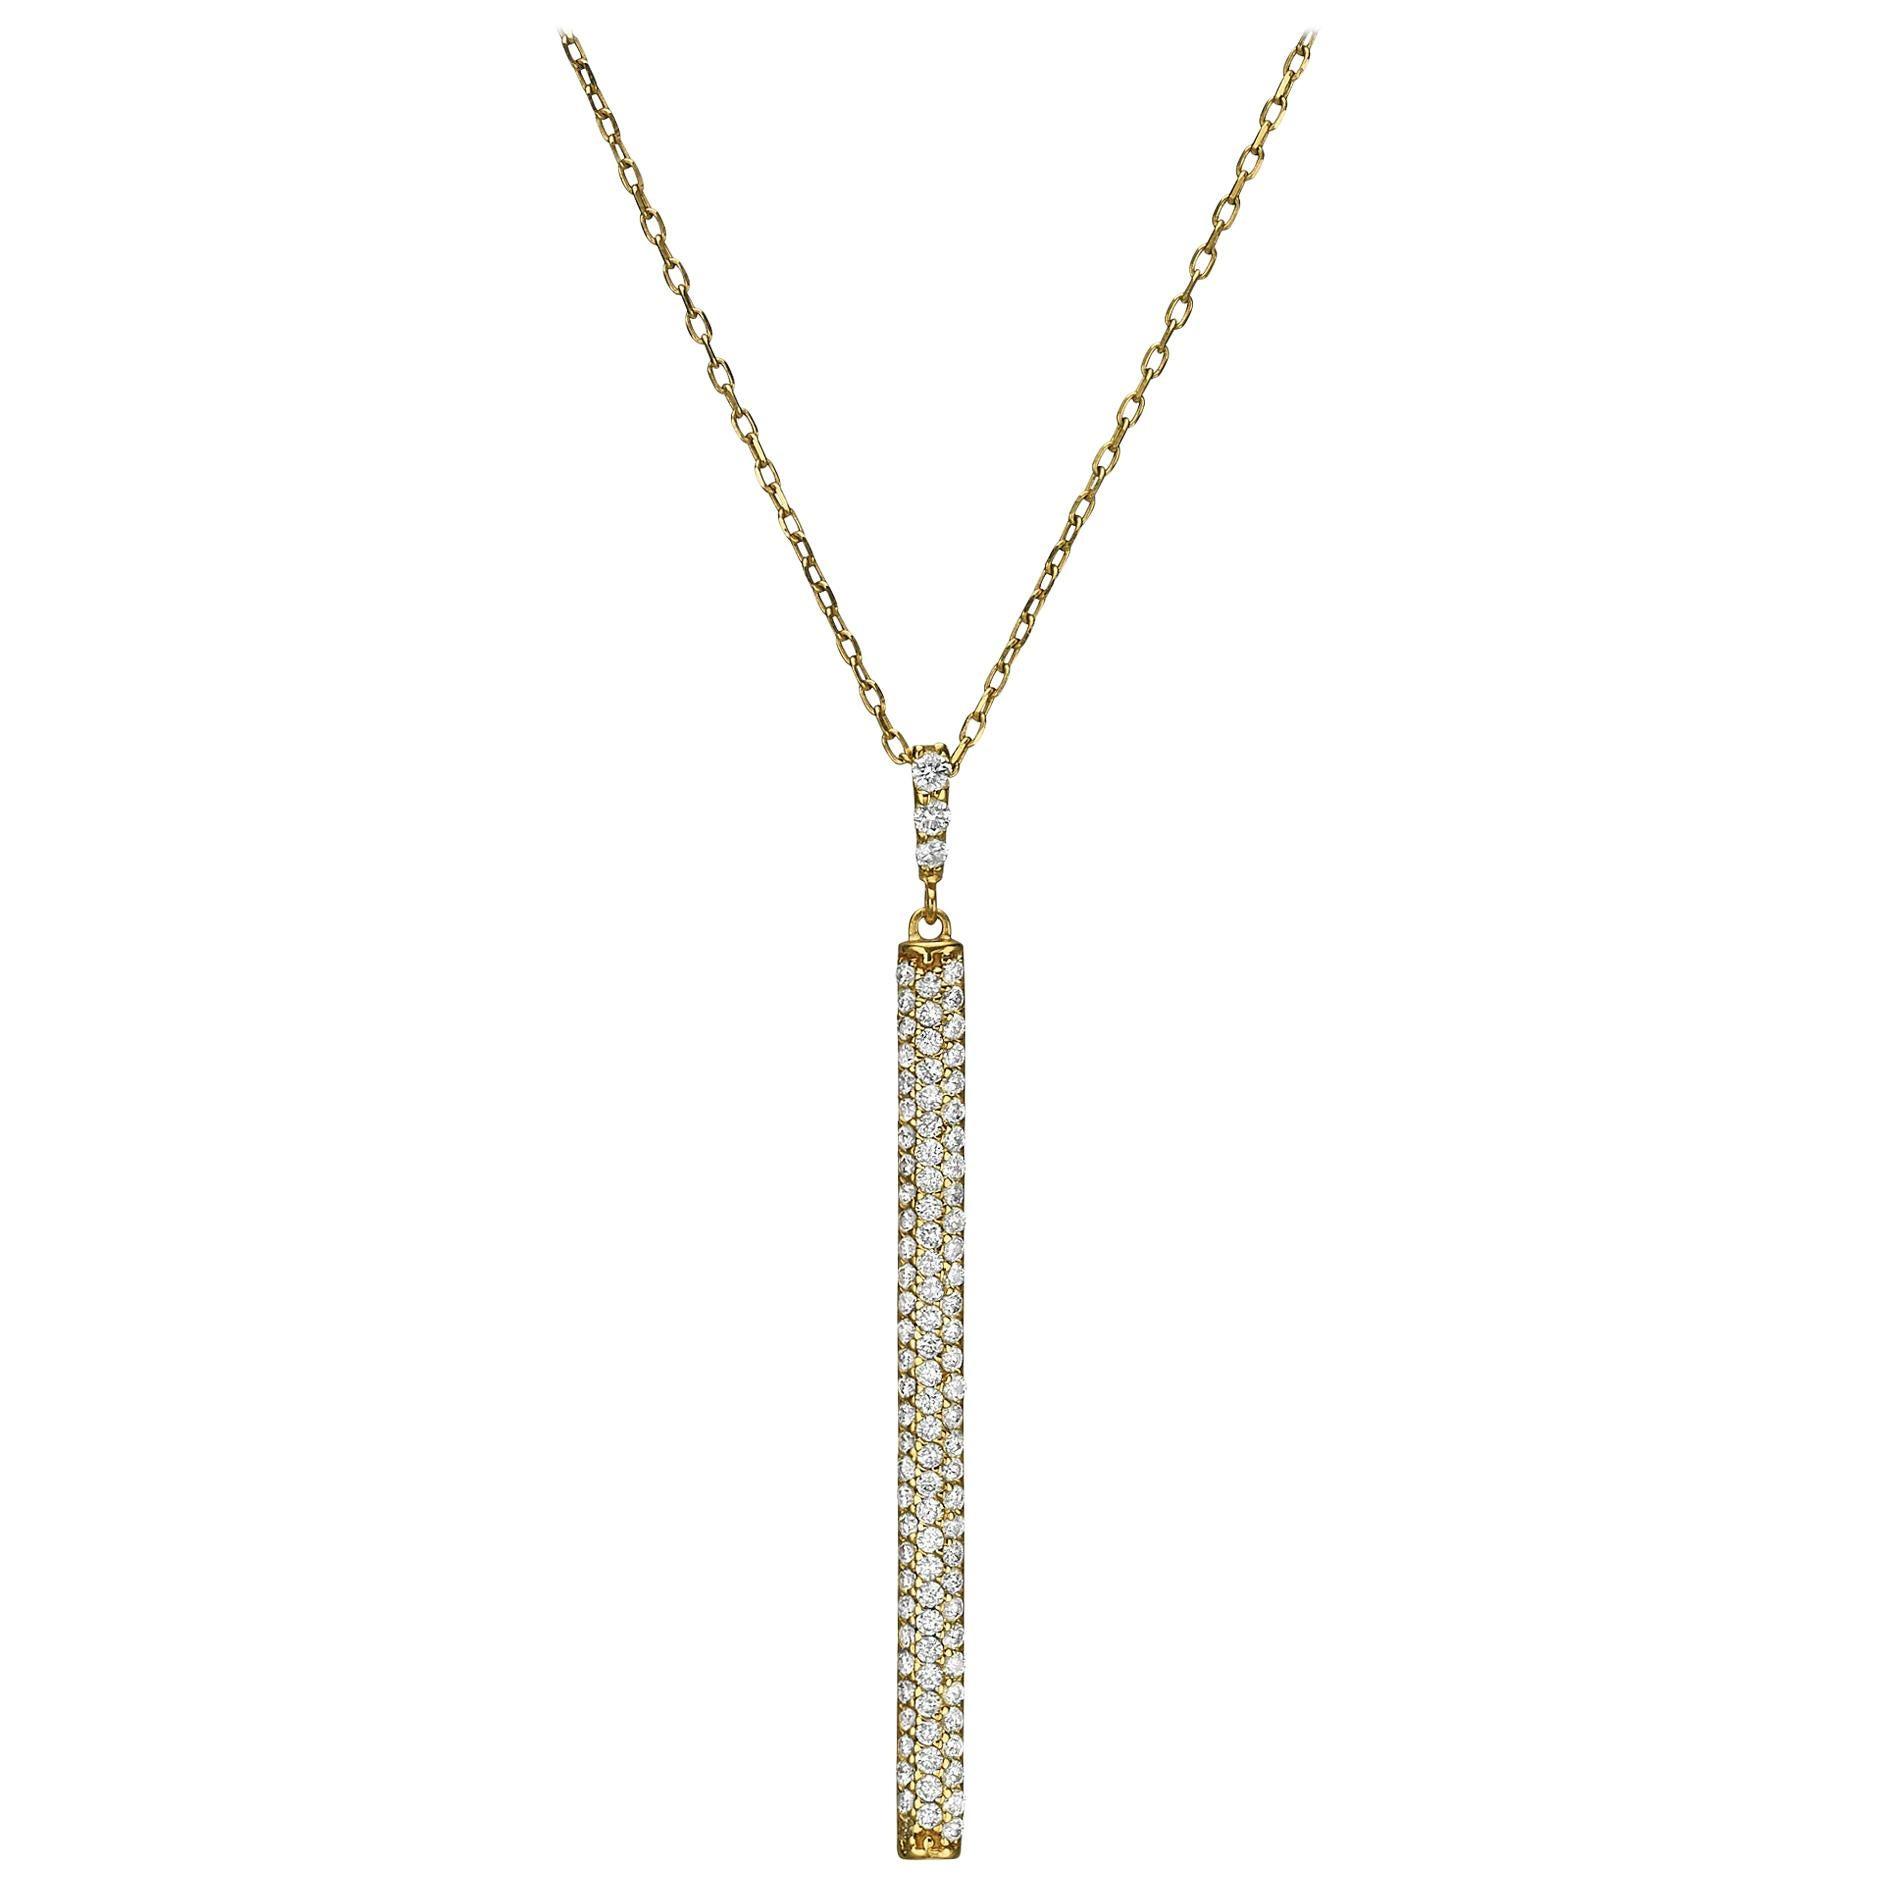 18k Gold, 0.70 Carat, F Color, VS Clarity, Diamond Vertical Bar Pendant Necklace